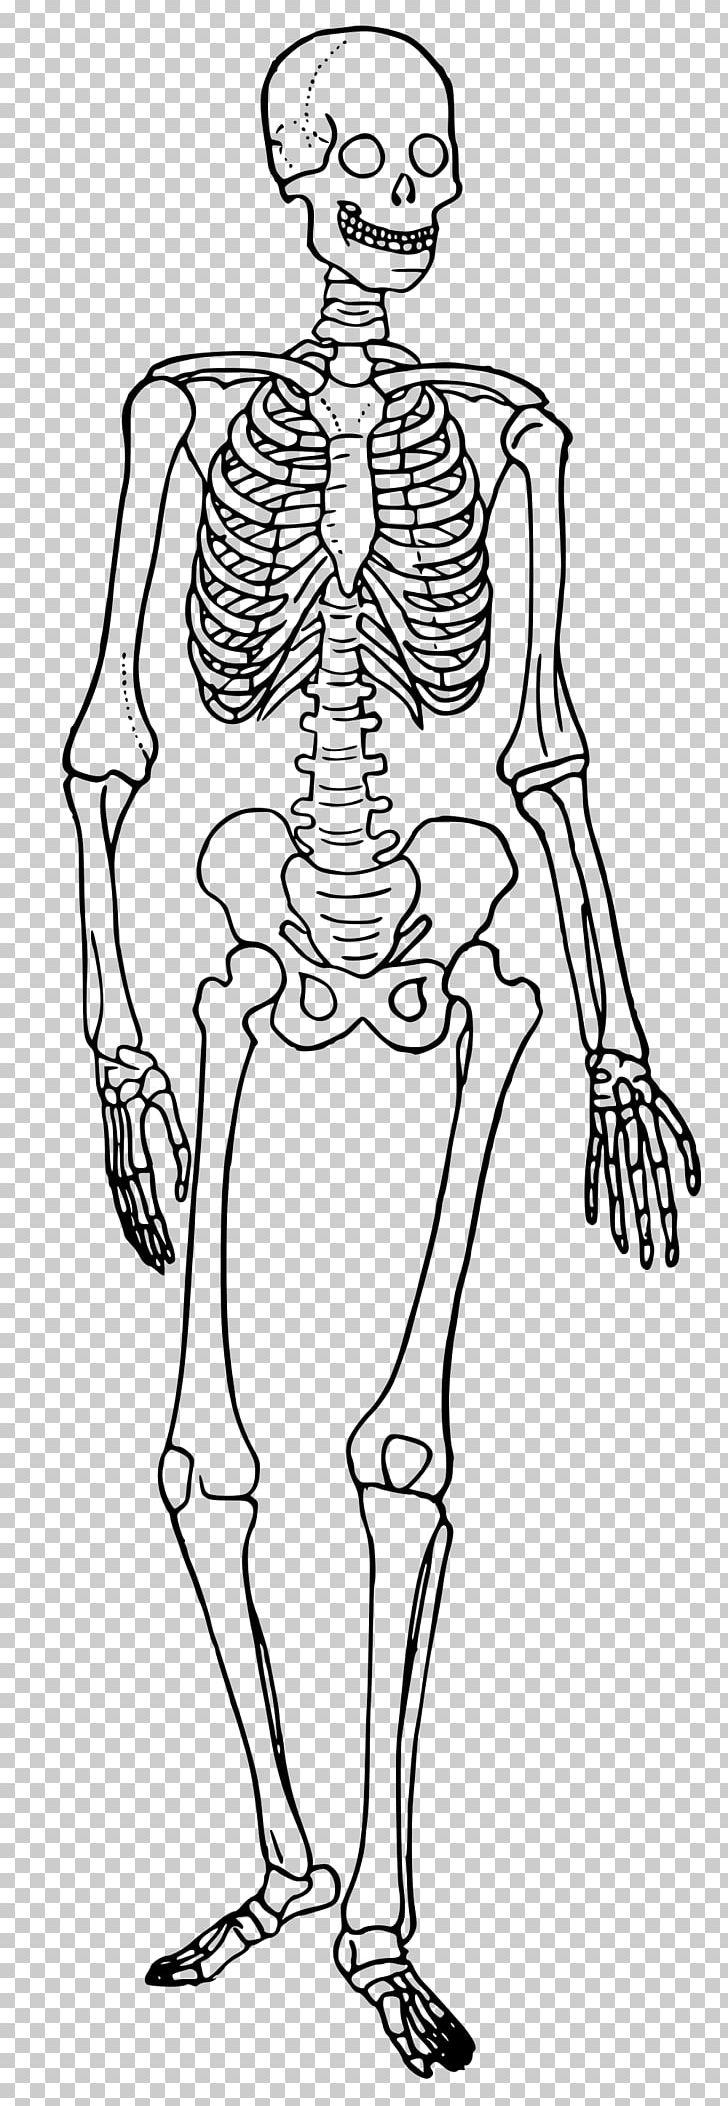 Skeletal System Diagram The Skeletal System Human Skeleton Human Body Diagram Bone Png